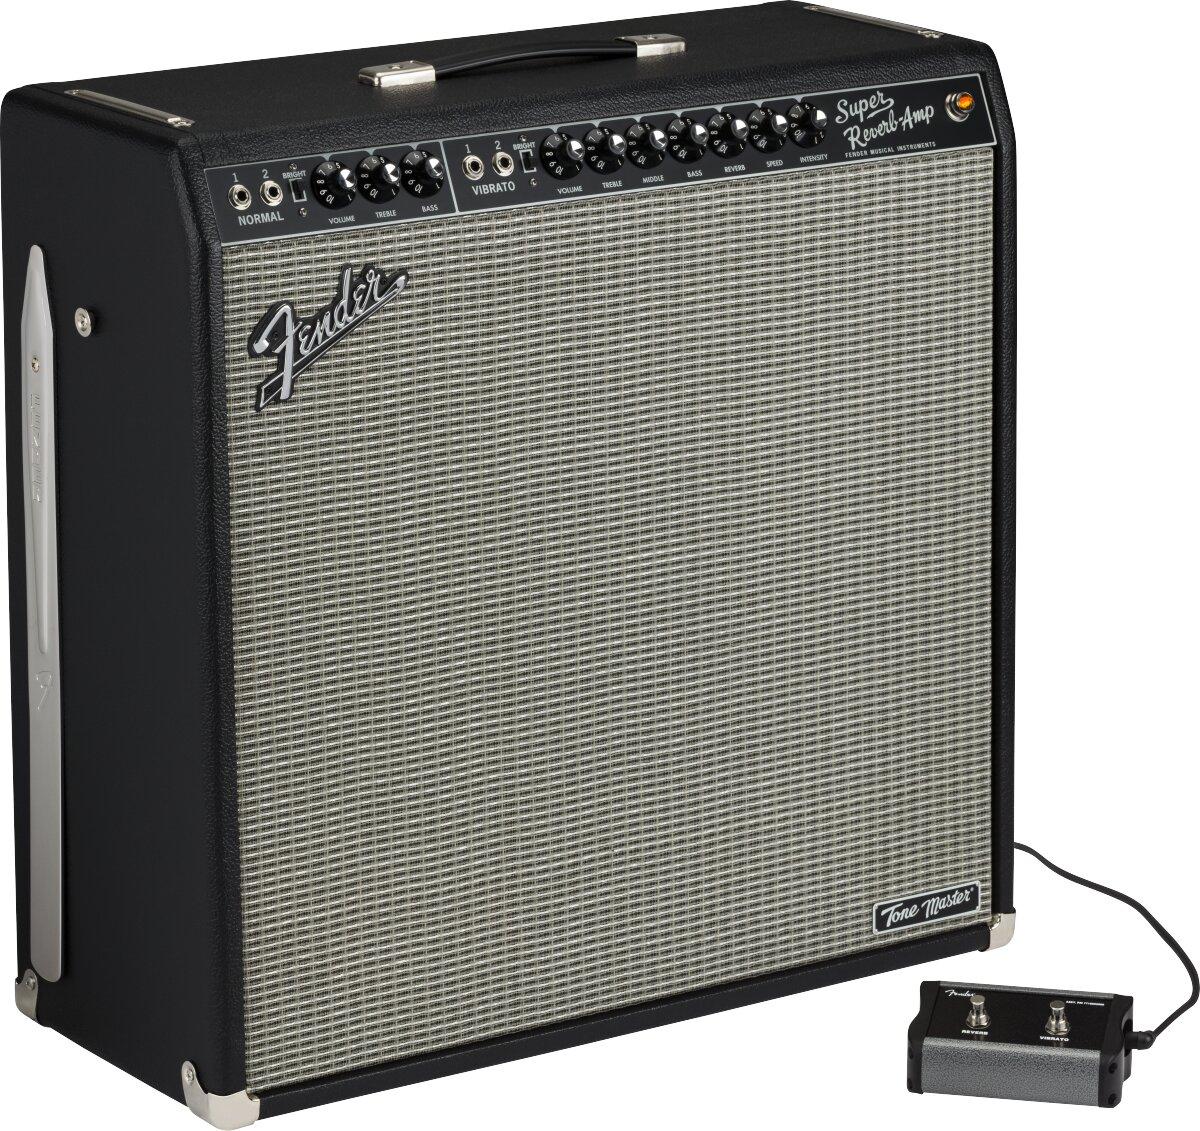 Fender Tone Master Super Reverb : photo 3